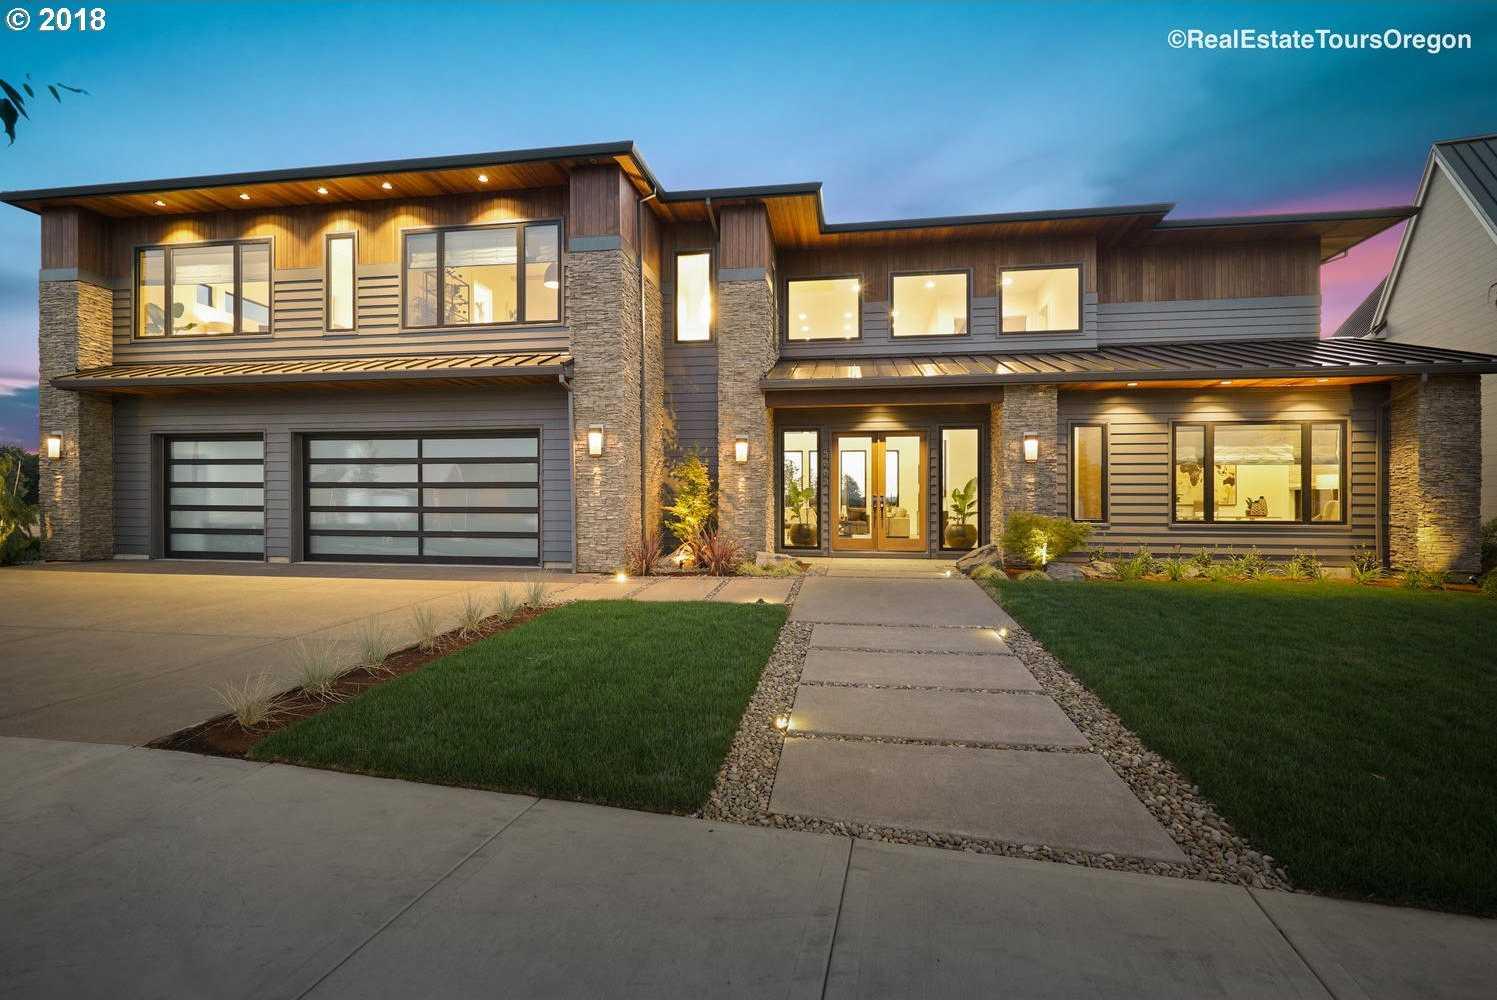 $1,690,000 - 4Br/5Ba -  for Sale in Hillsboro